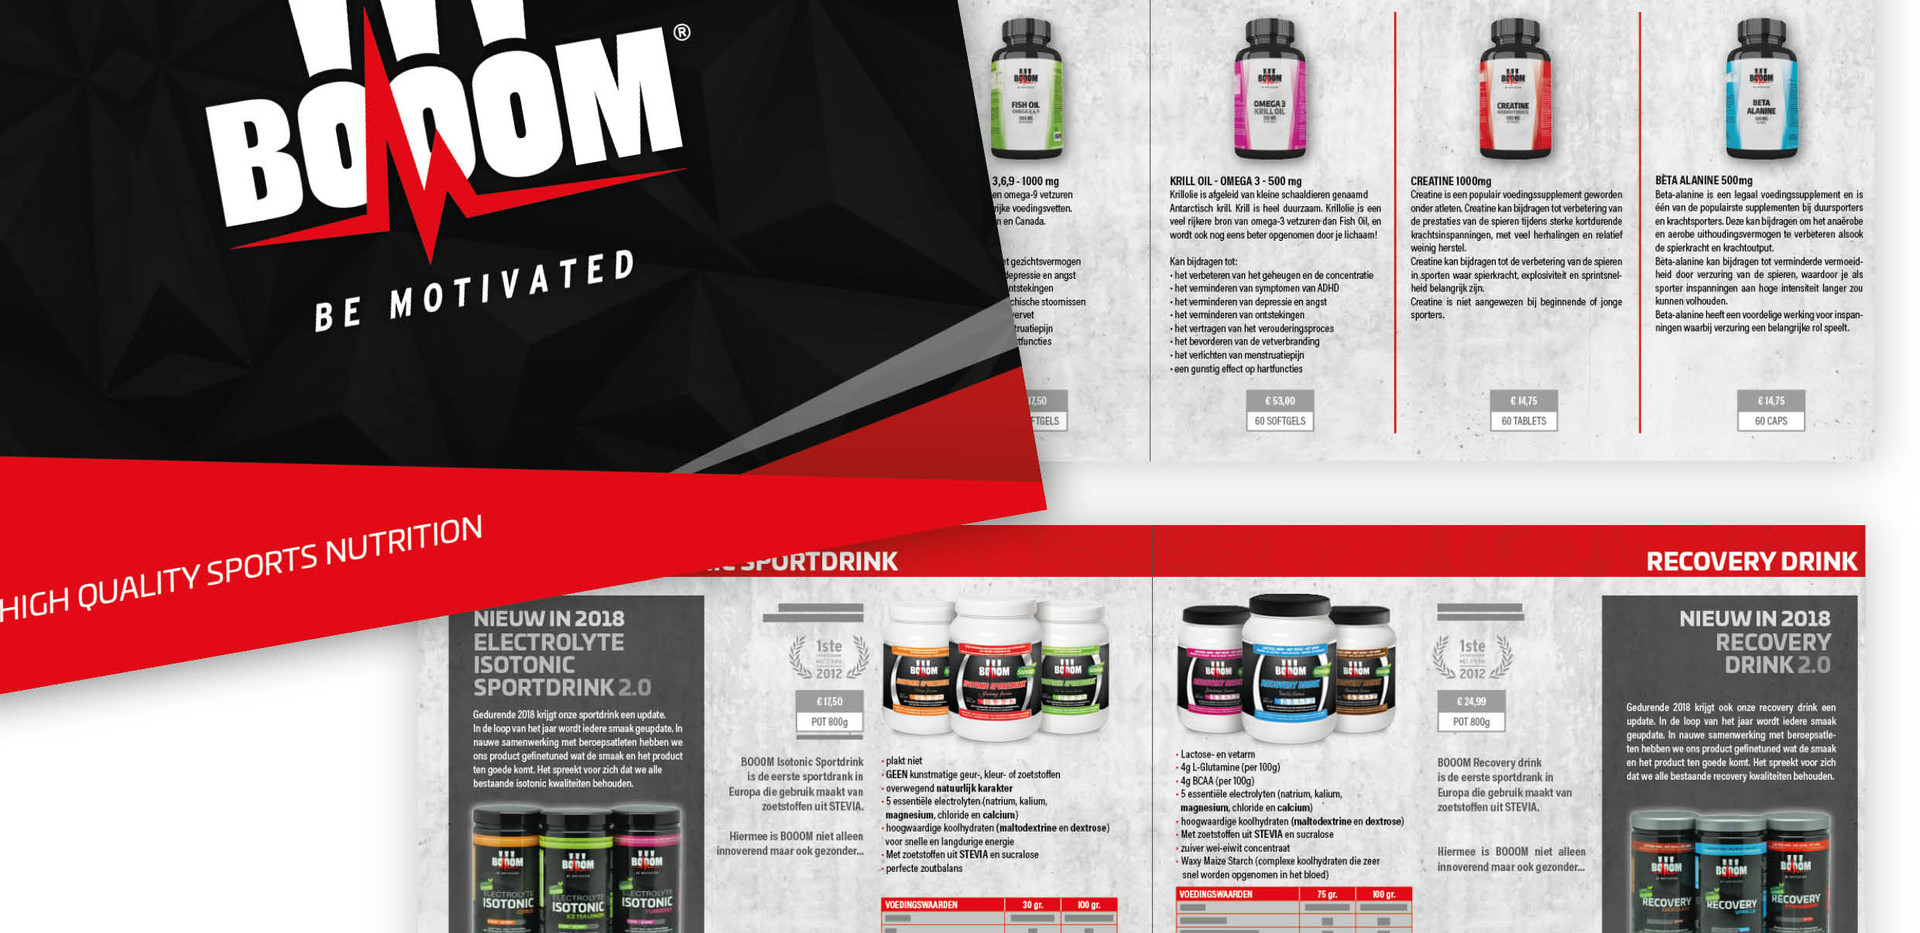 Booom High Quality Nutrition